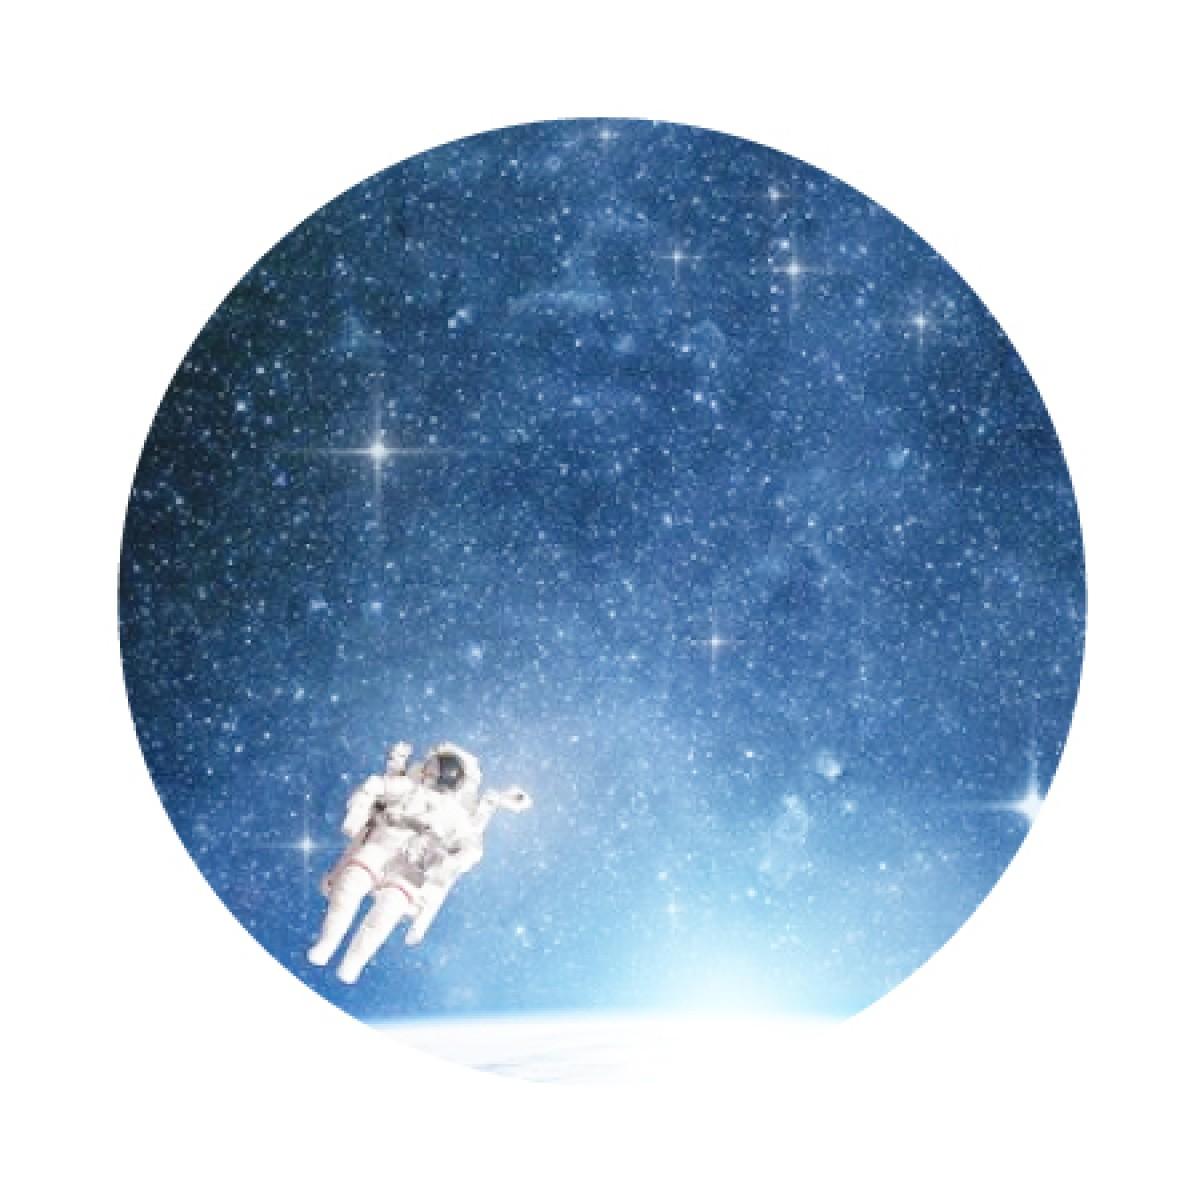 Astronaut Whiteboard Sticker